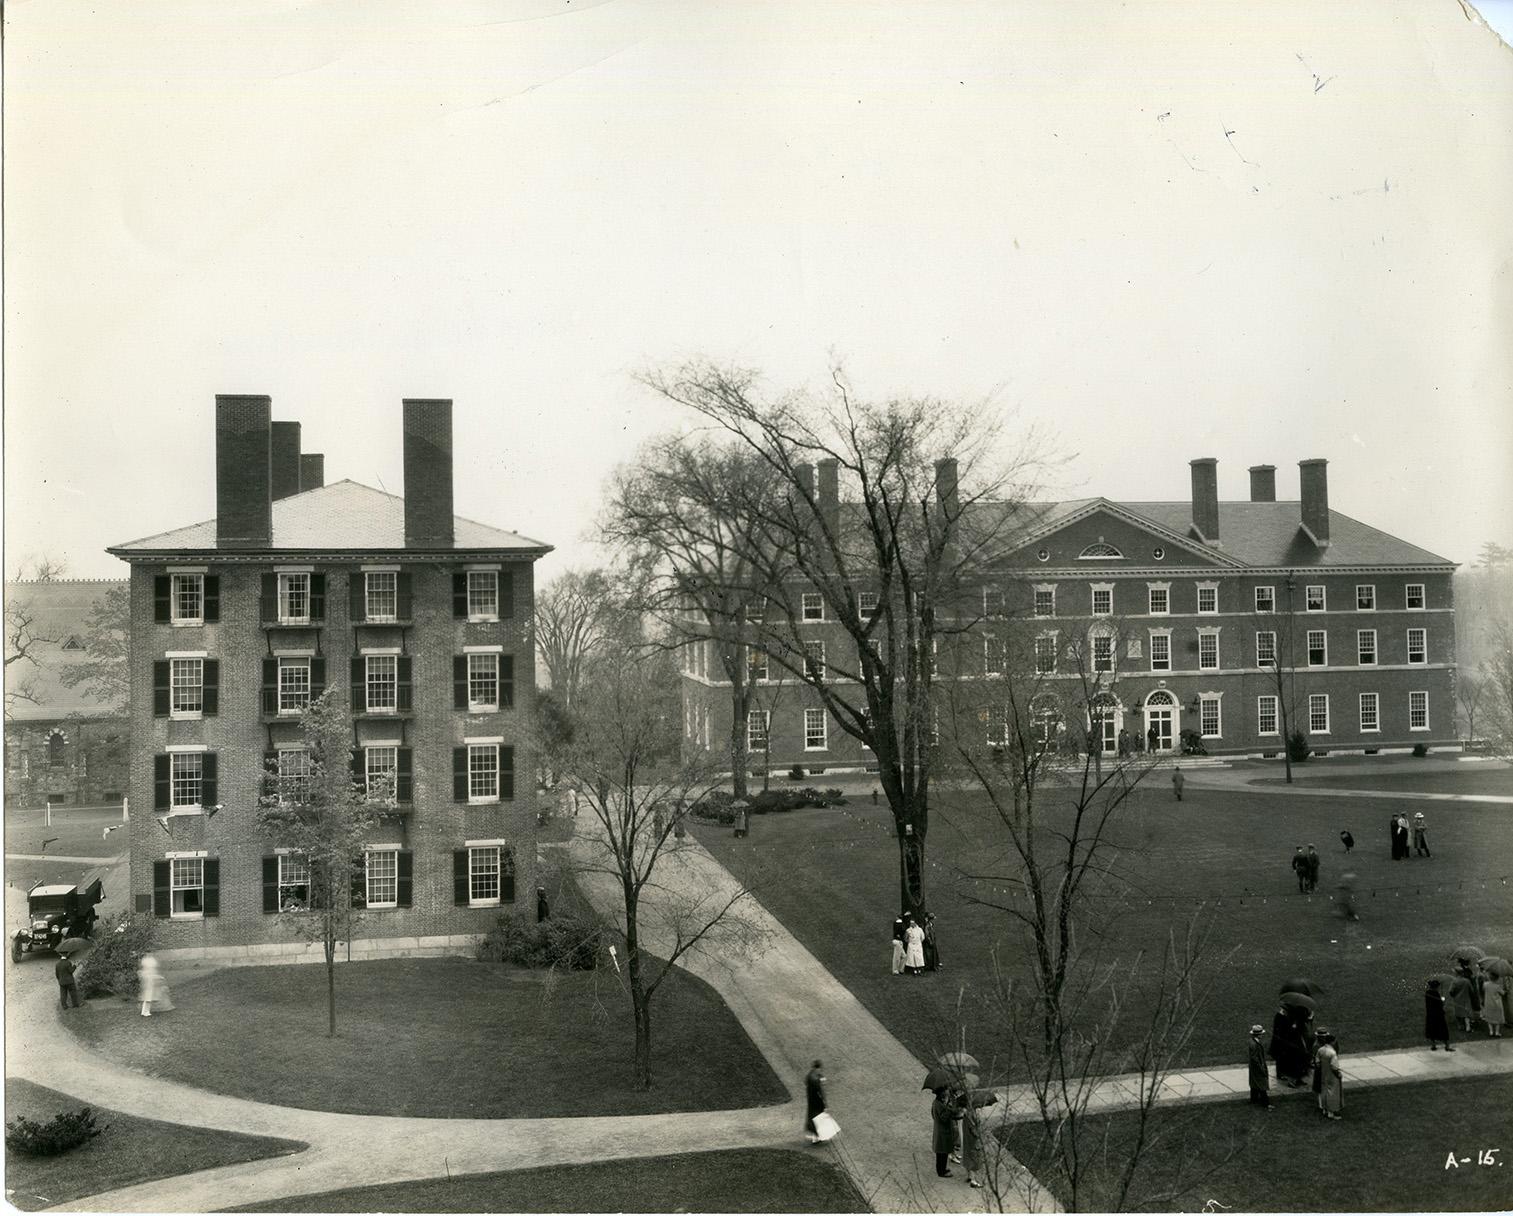 George Washington Hall, 1928. Photograph by George H. Davis. (Foxcroft Hall at left)